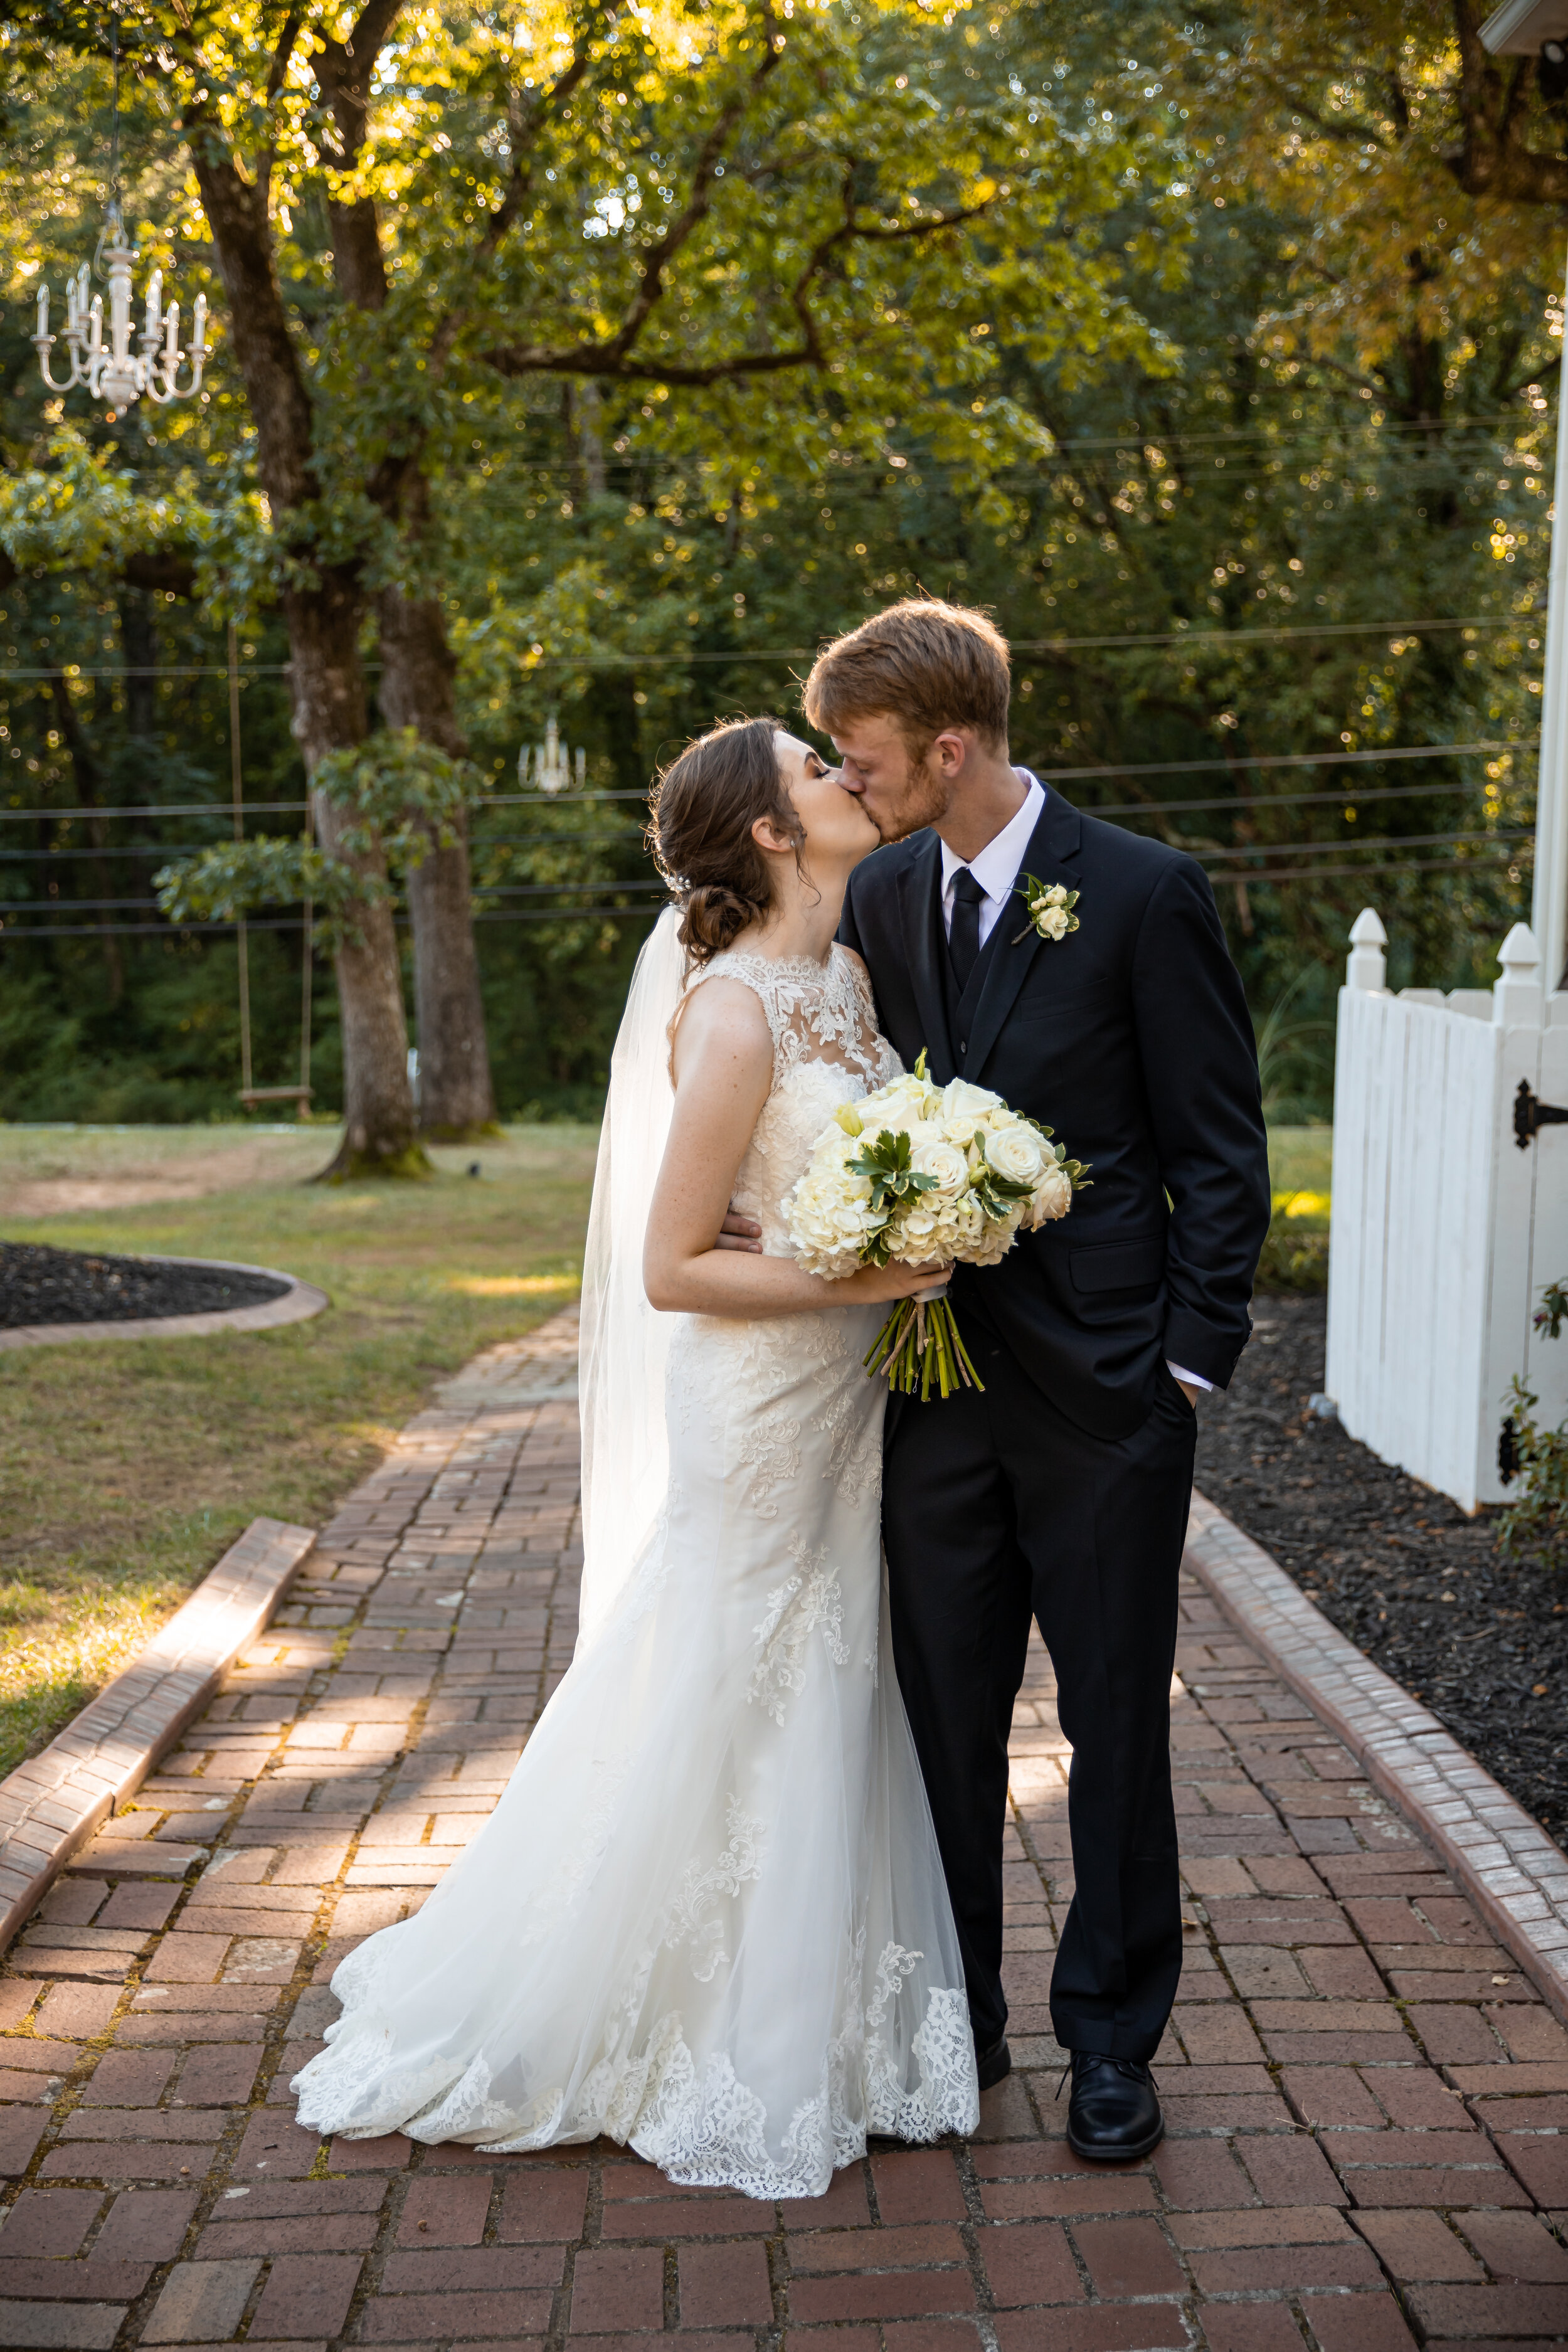 Pearson Wedding - Post Ceremony - Final Edit-78.jpg